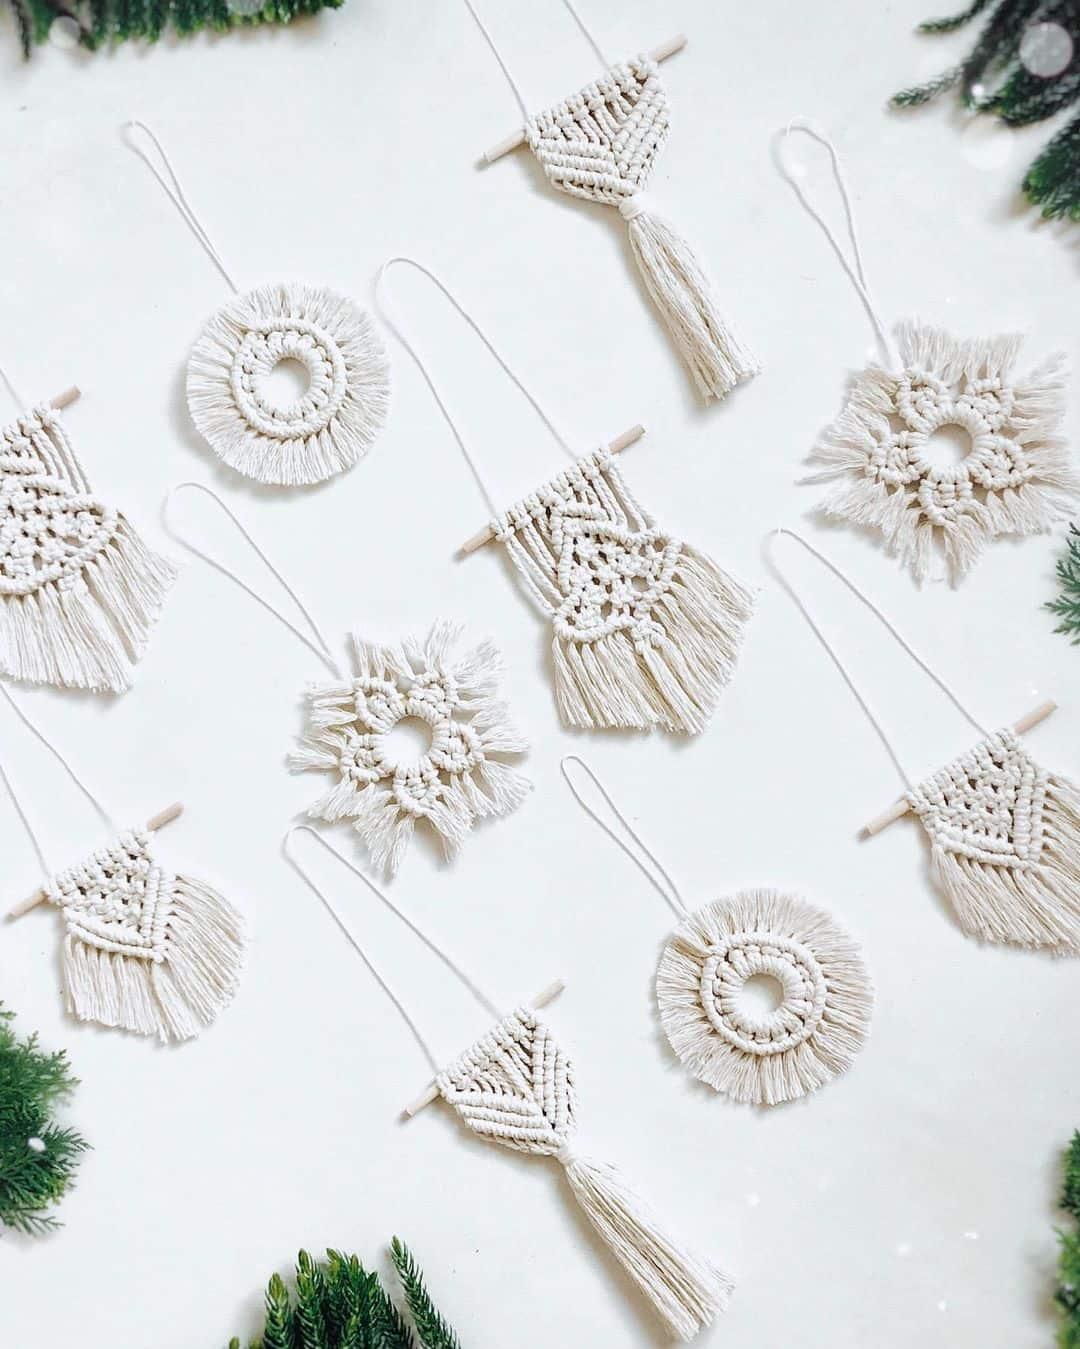 Crochet Christmas ornaments